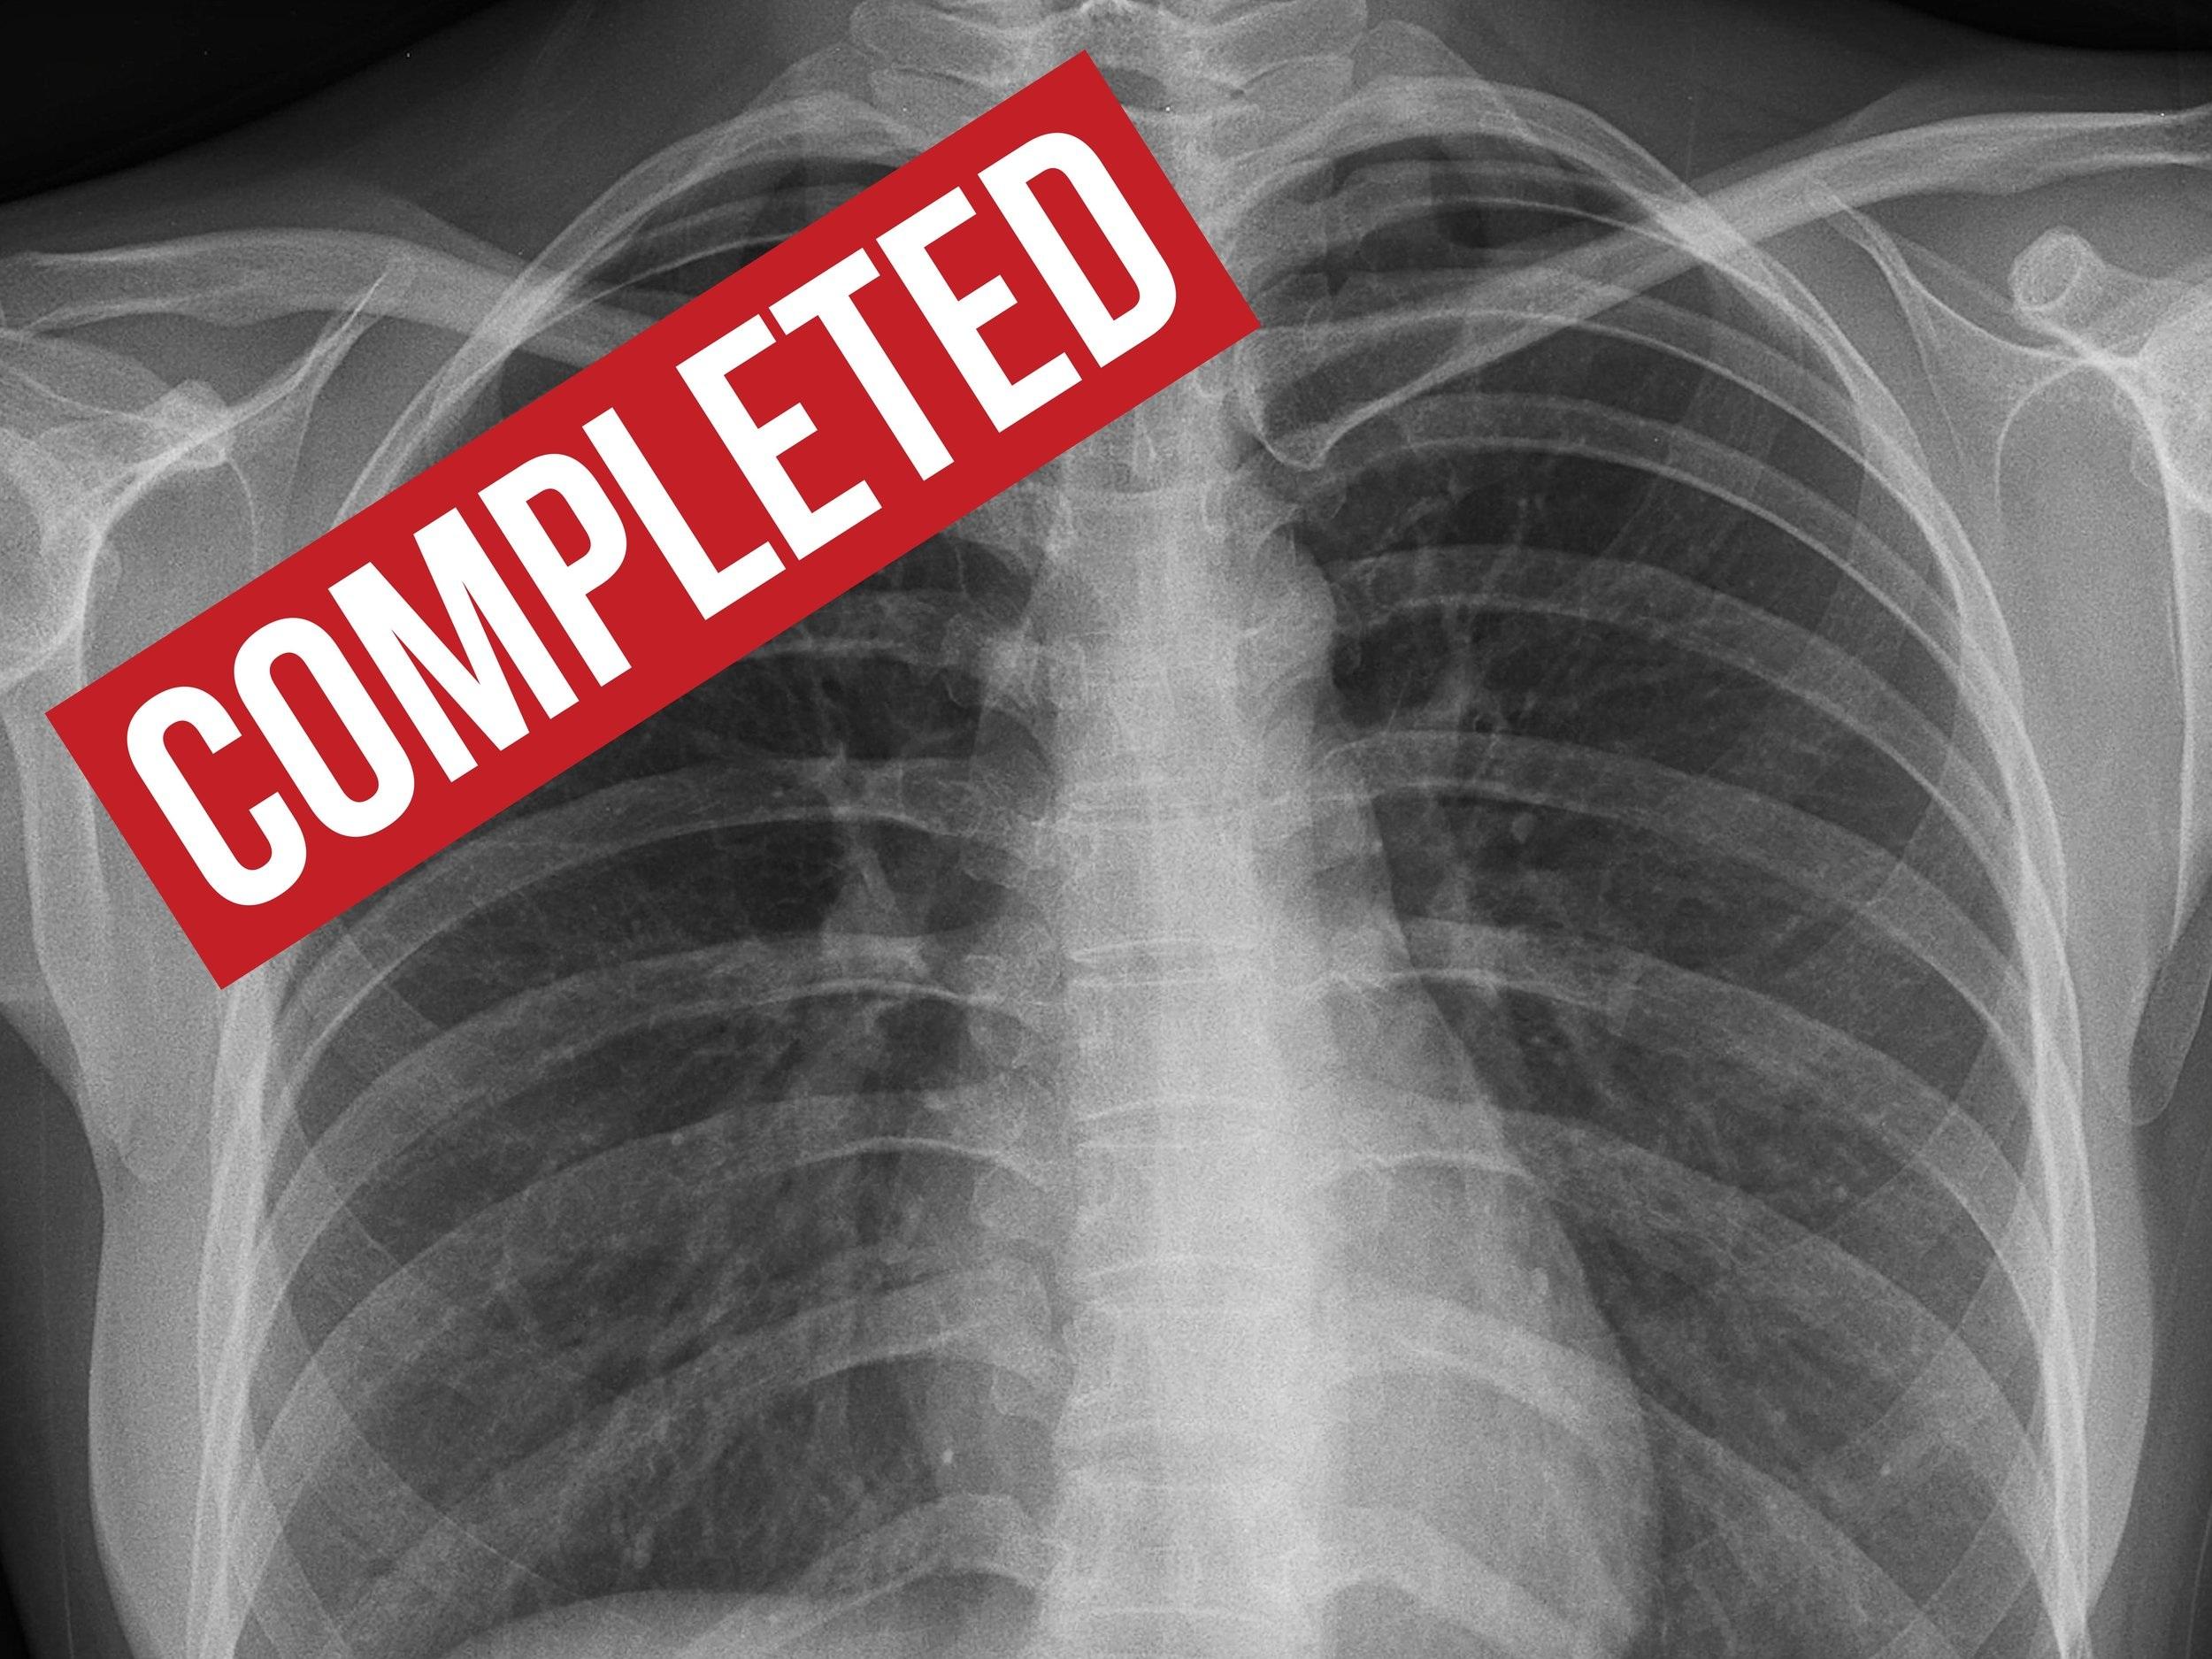 impact_latent_tuberculosis_study